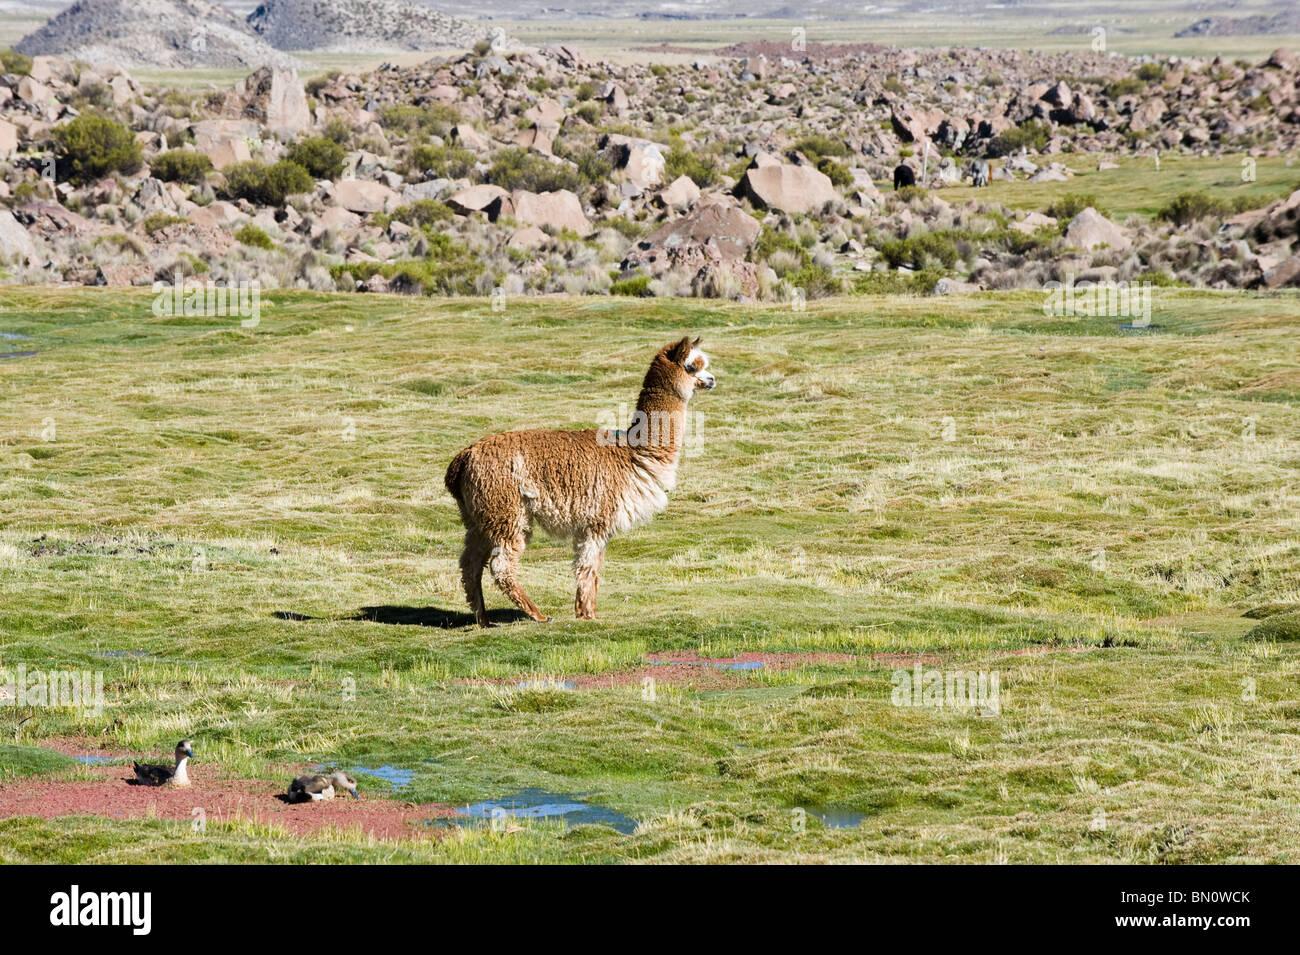 Alpaca (Lama pacos), Camelidae family, Lauca National Park, Arica and Parinacota Region, Chile - Stock Image